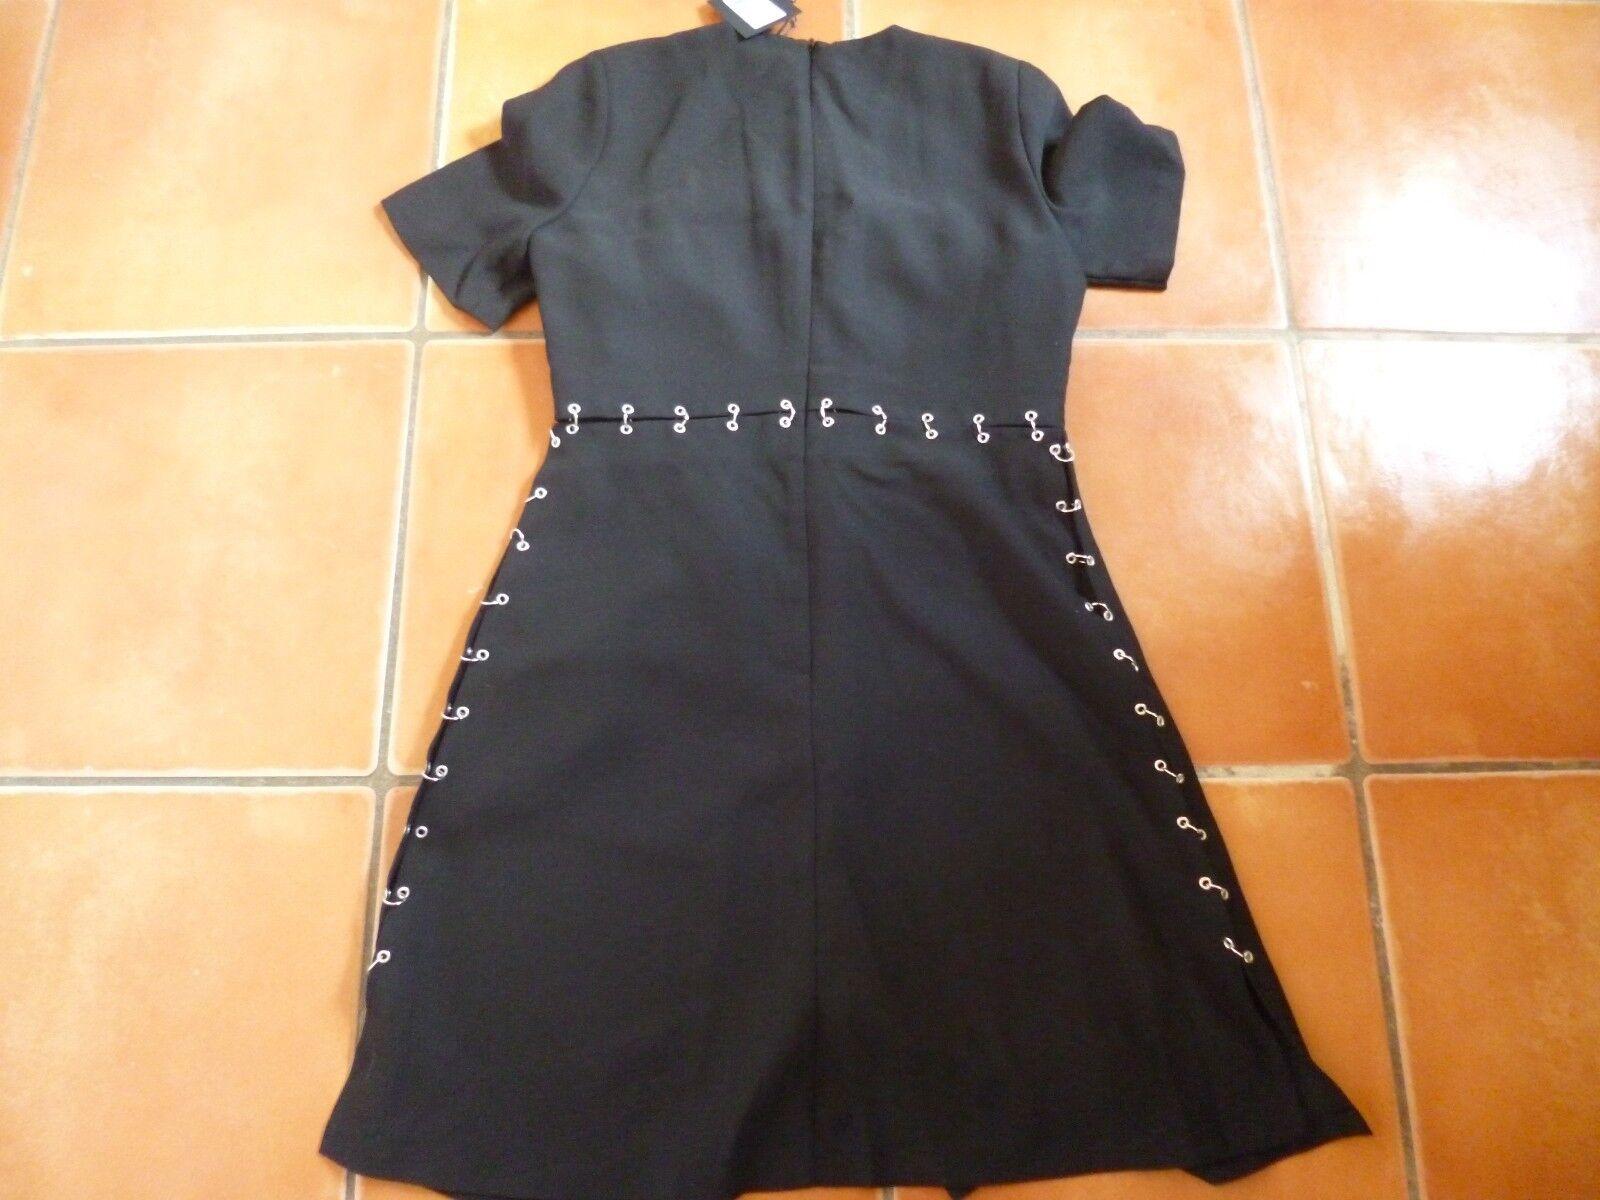 BNWT BNWT BNWT KOOPLES nero a contrasto THE vestito, S, 8-10 75d2ba